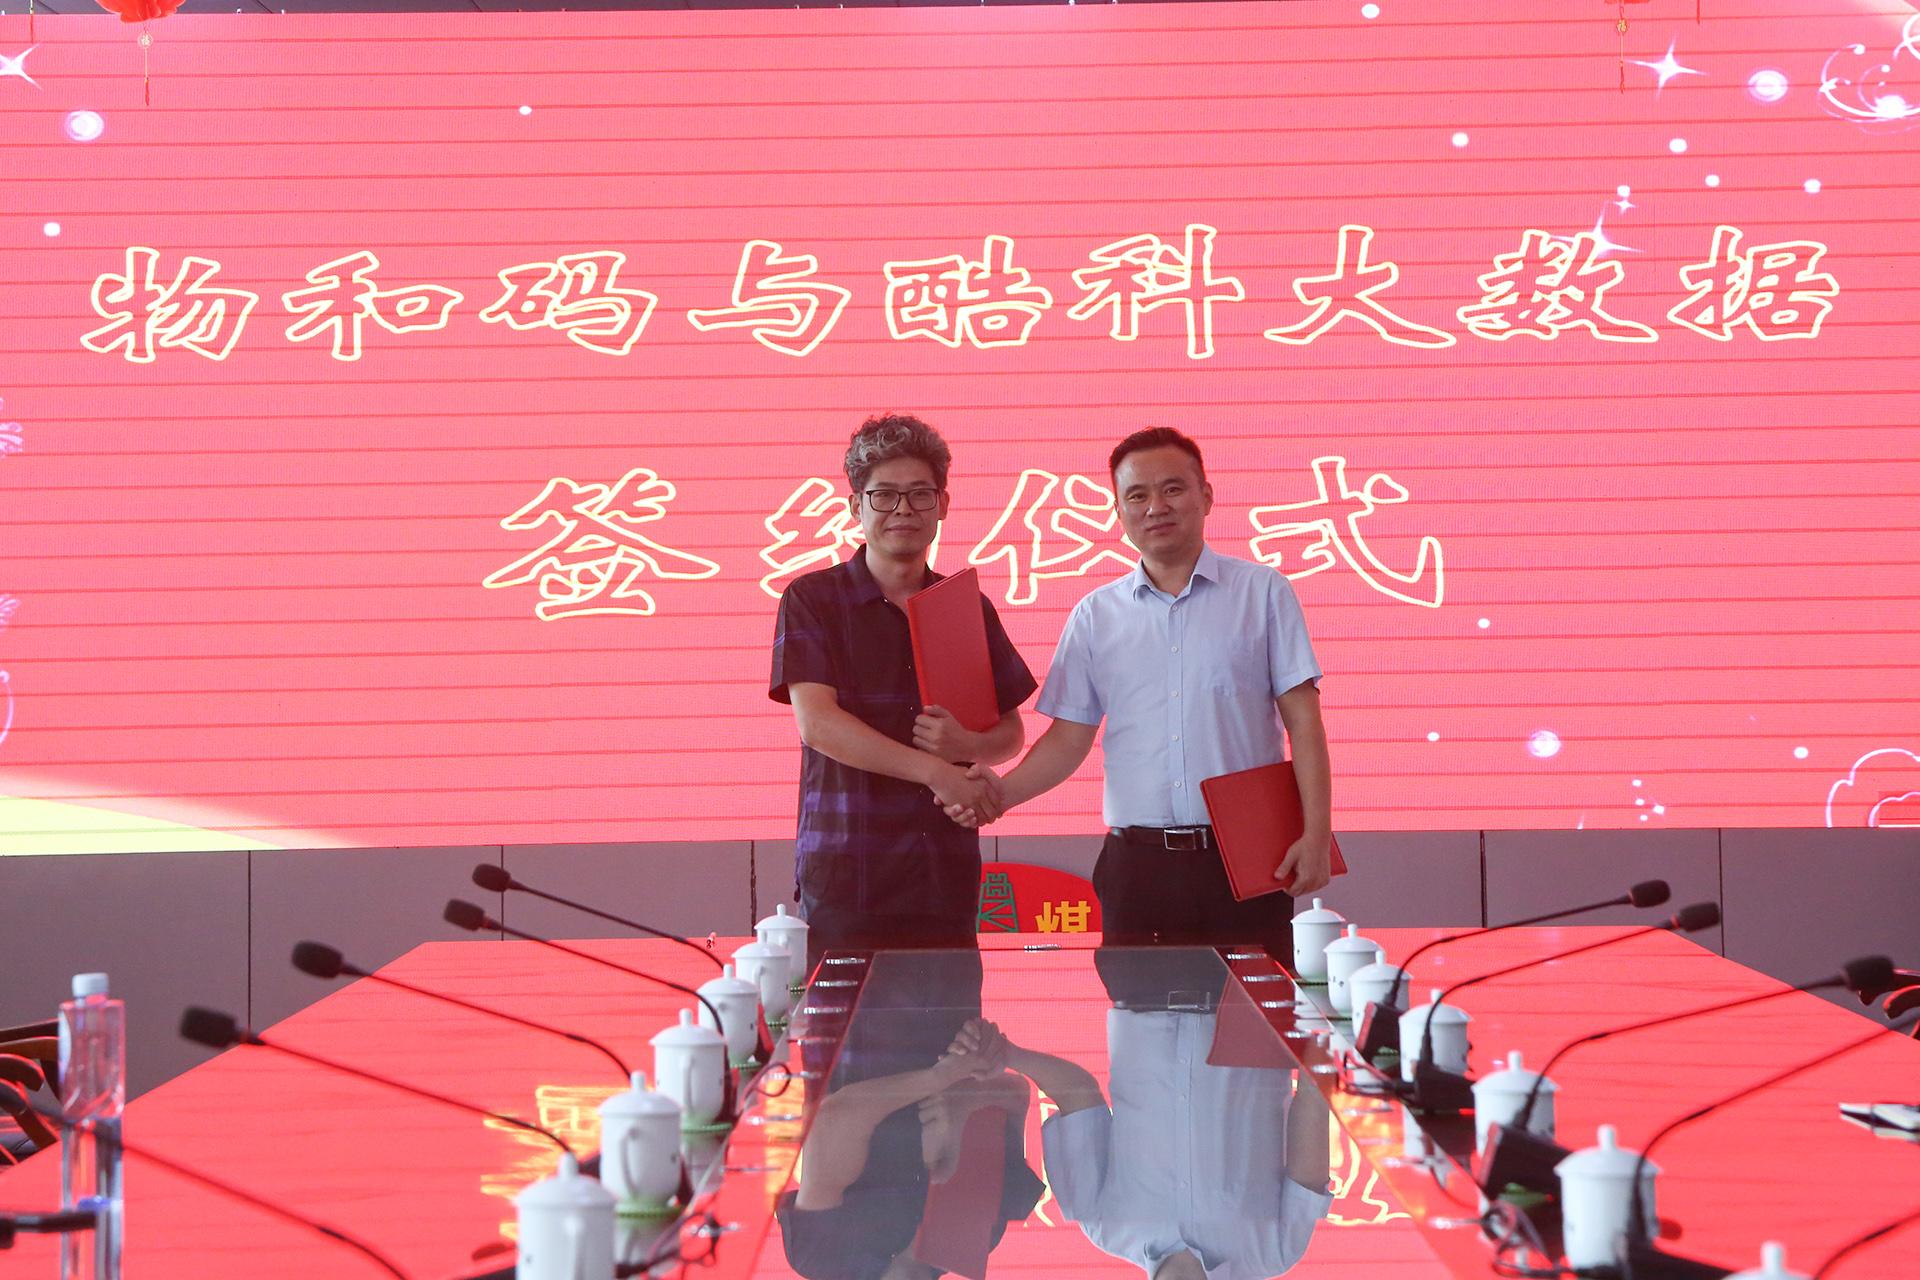 Warm Congratulations China Coal Group Big Data Company And Jinan Wuhema Technology Company Successfully Signed